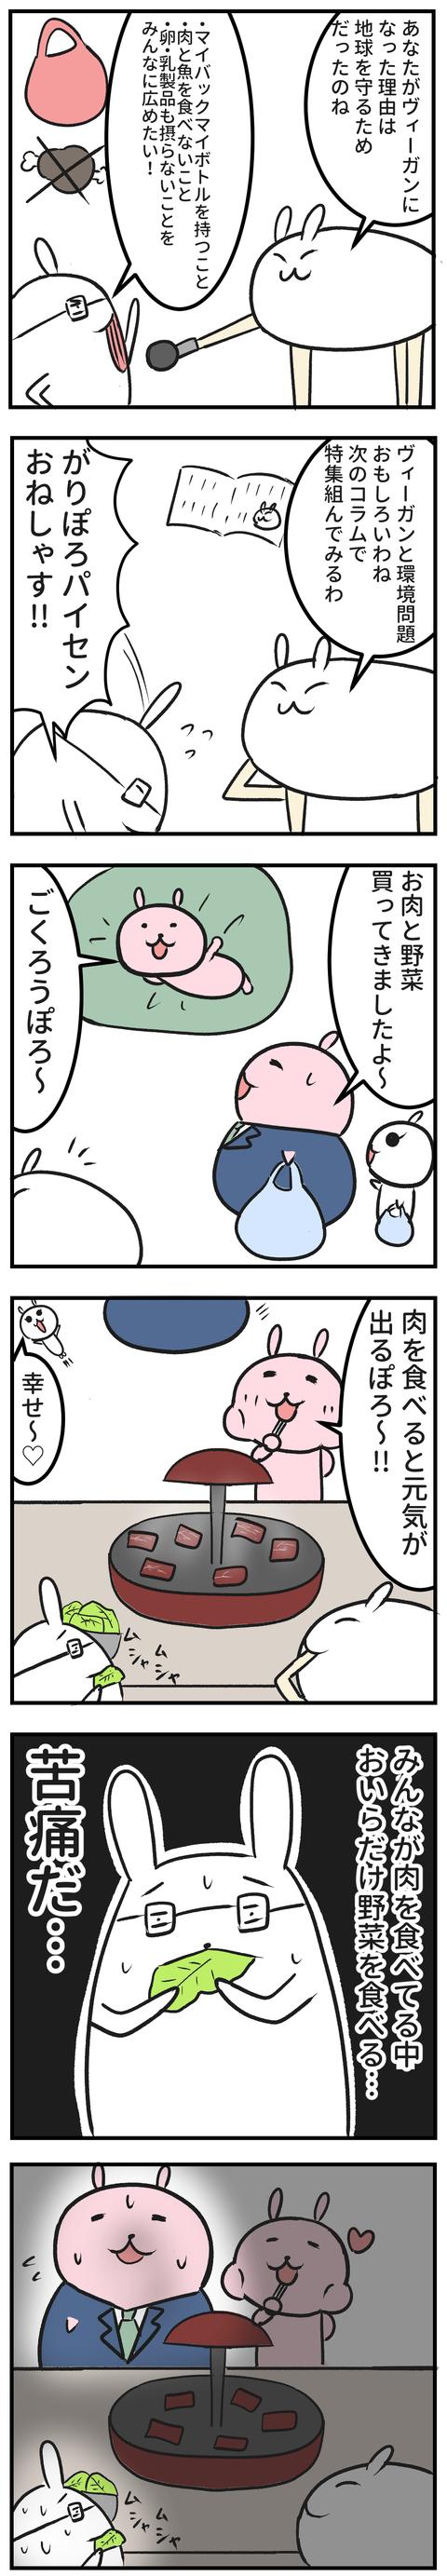 manga-yuzuporo18-1